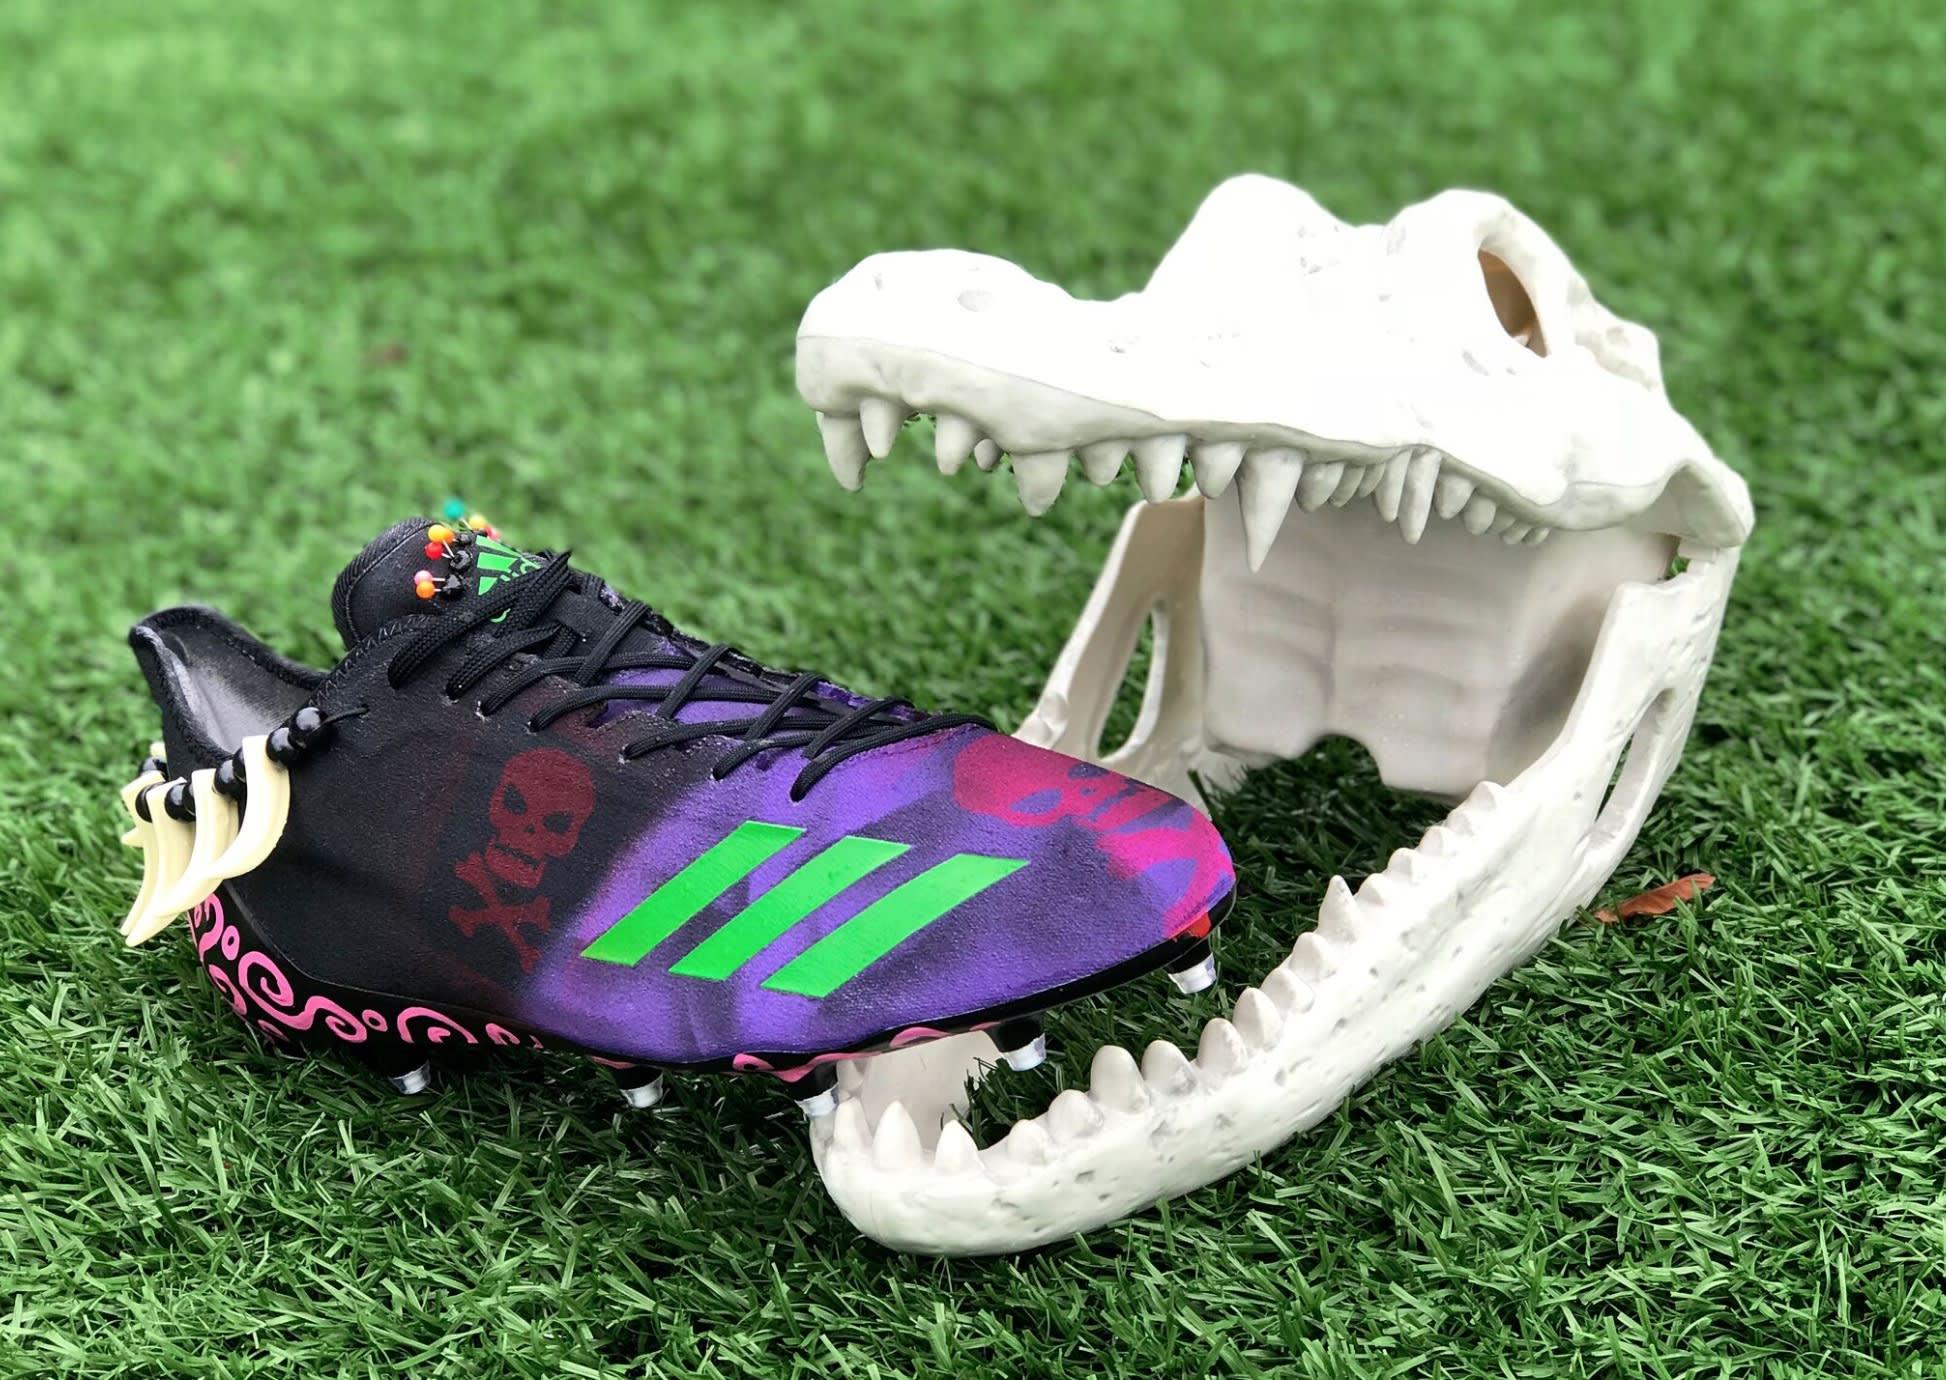 Adidas Adizero Landon Collins Halloween Side